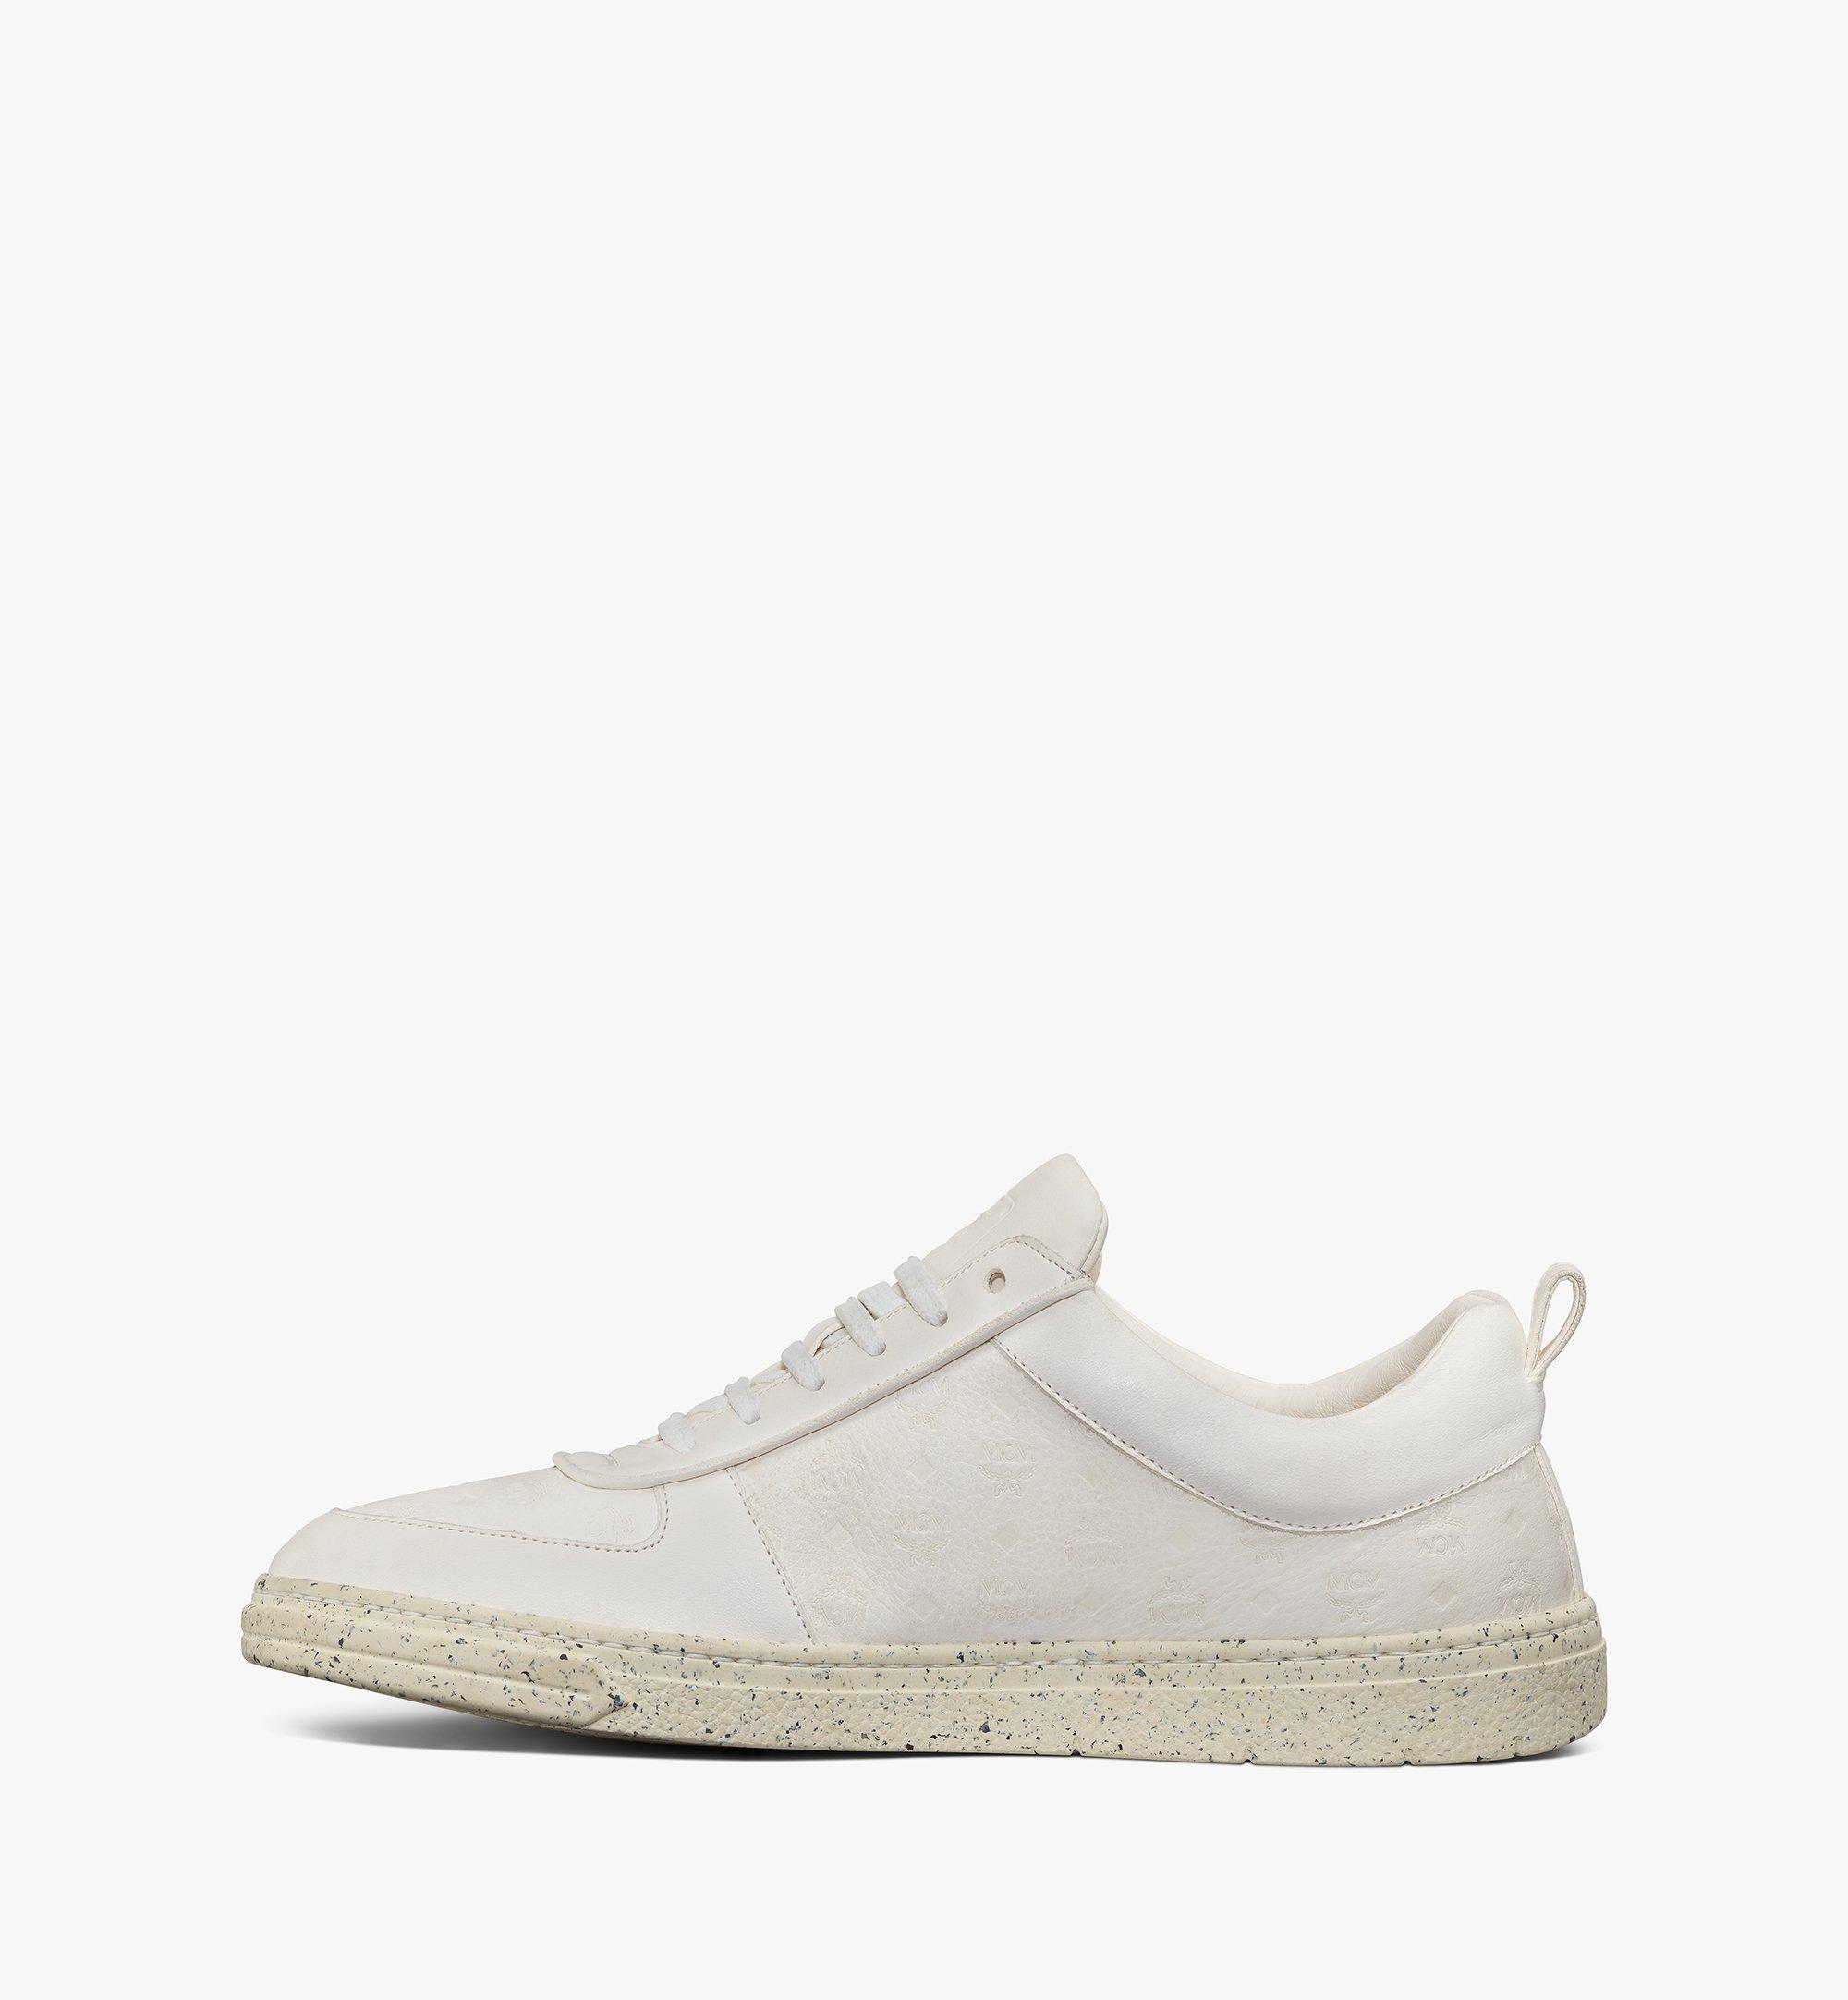 MCM Men's Sustainable Terrain Lo Sneakers White MEXAAMM14WT040 Alternate View 1